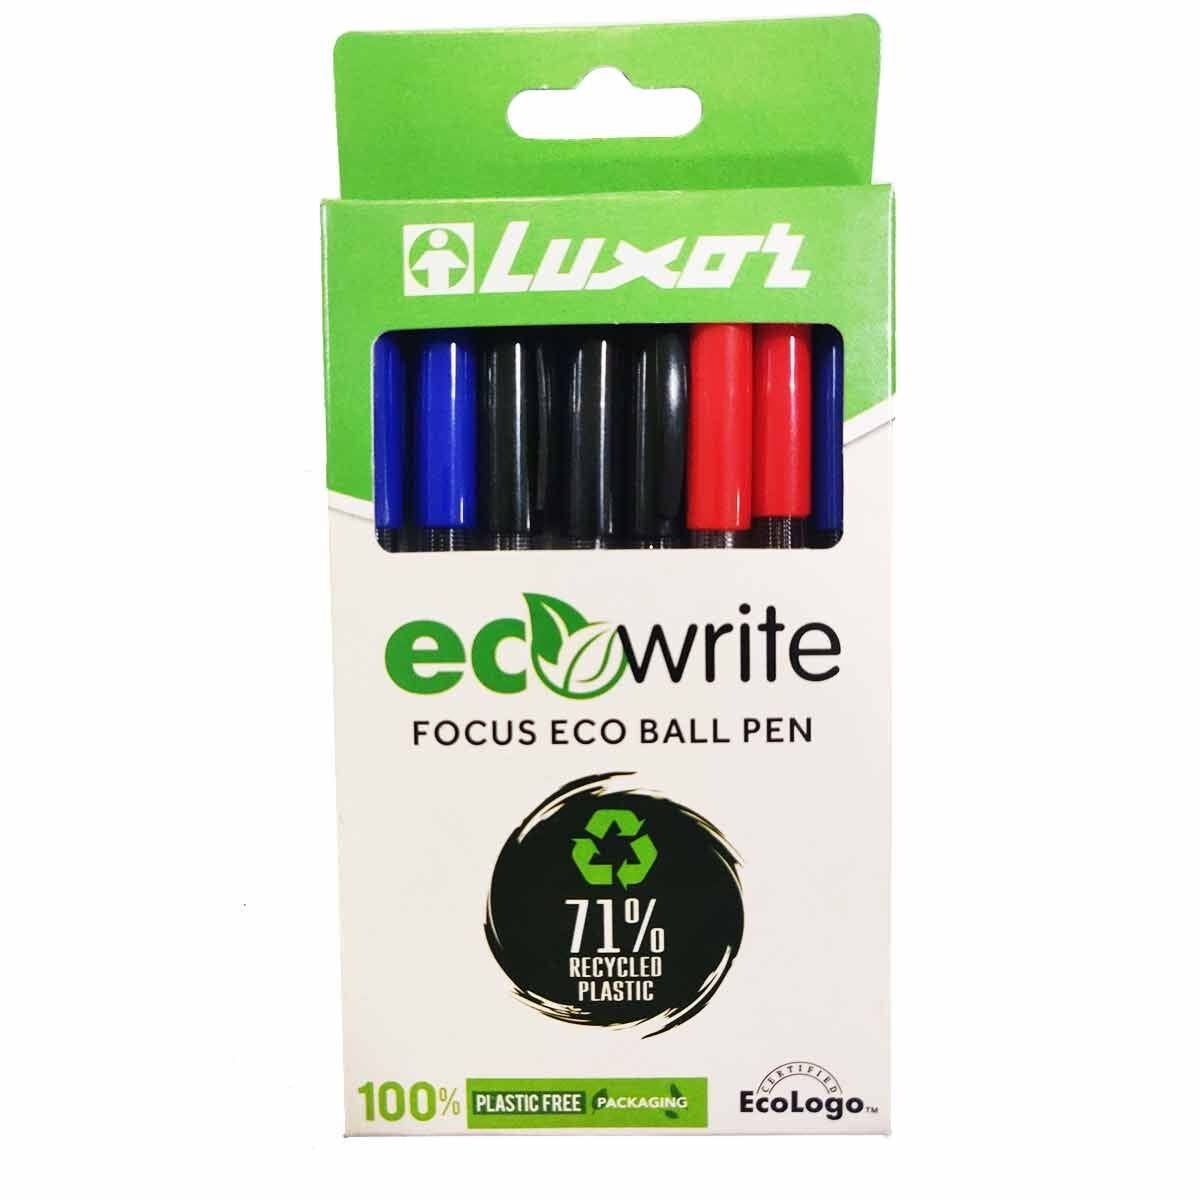 Luxor ecowrite Focus Ballpoint Pens Pack of 8